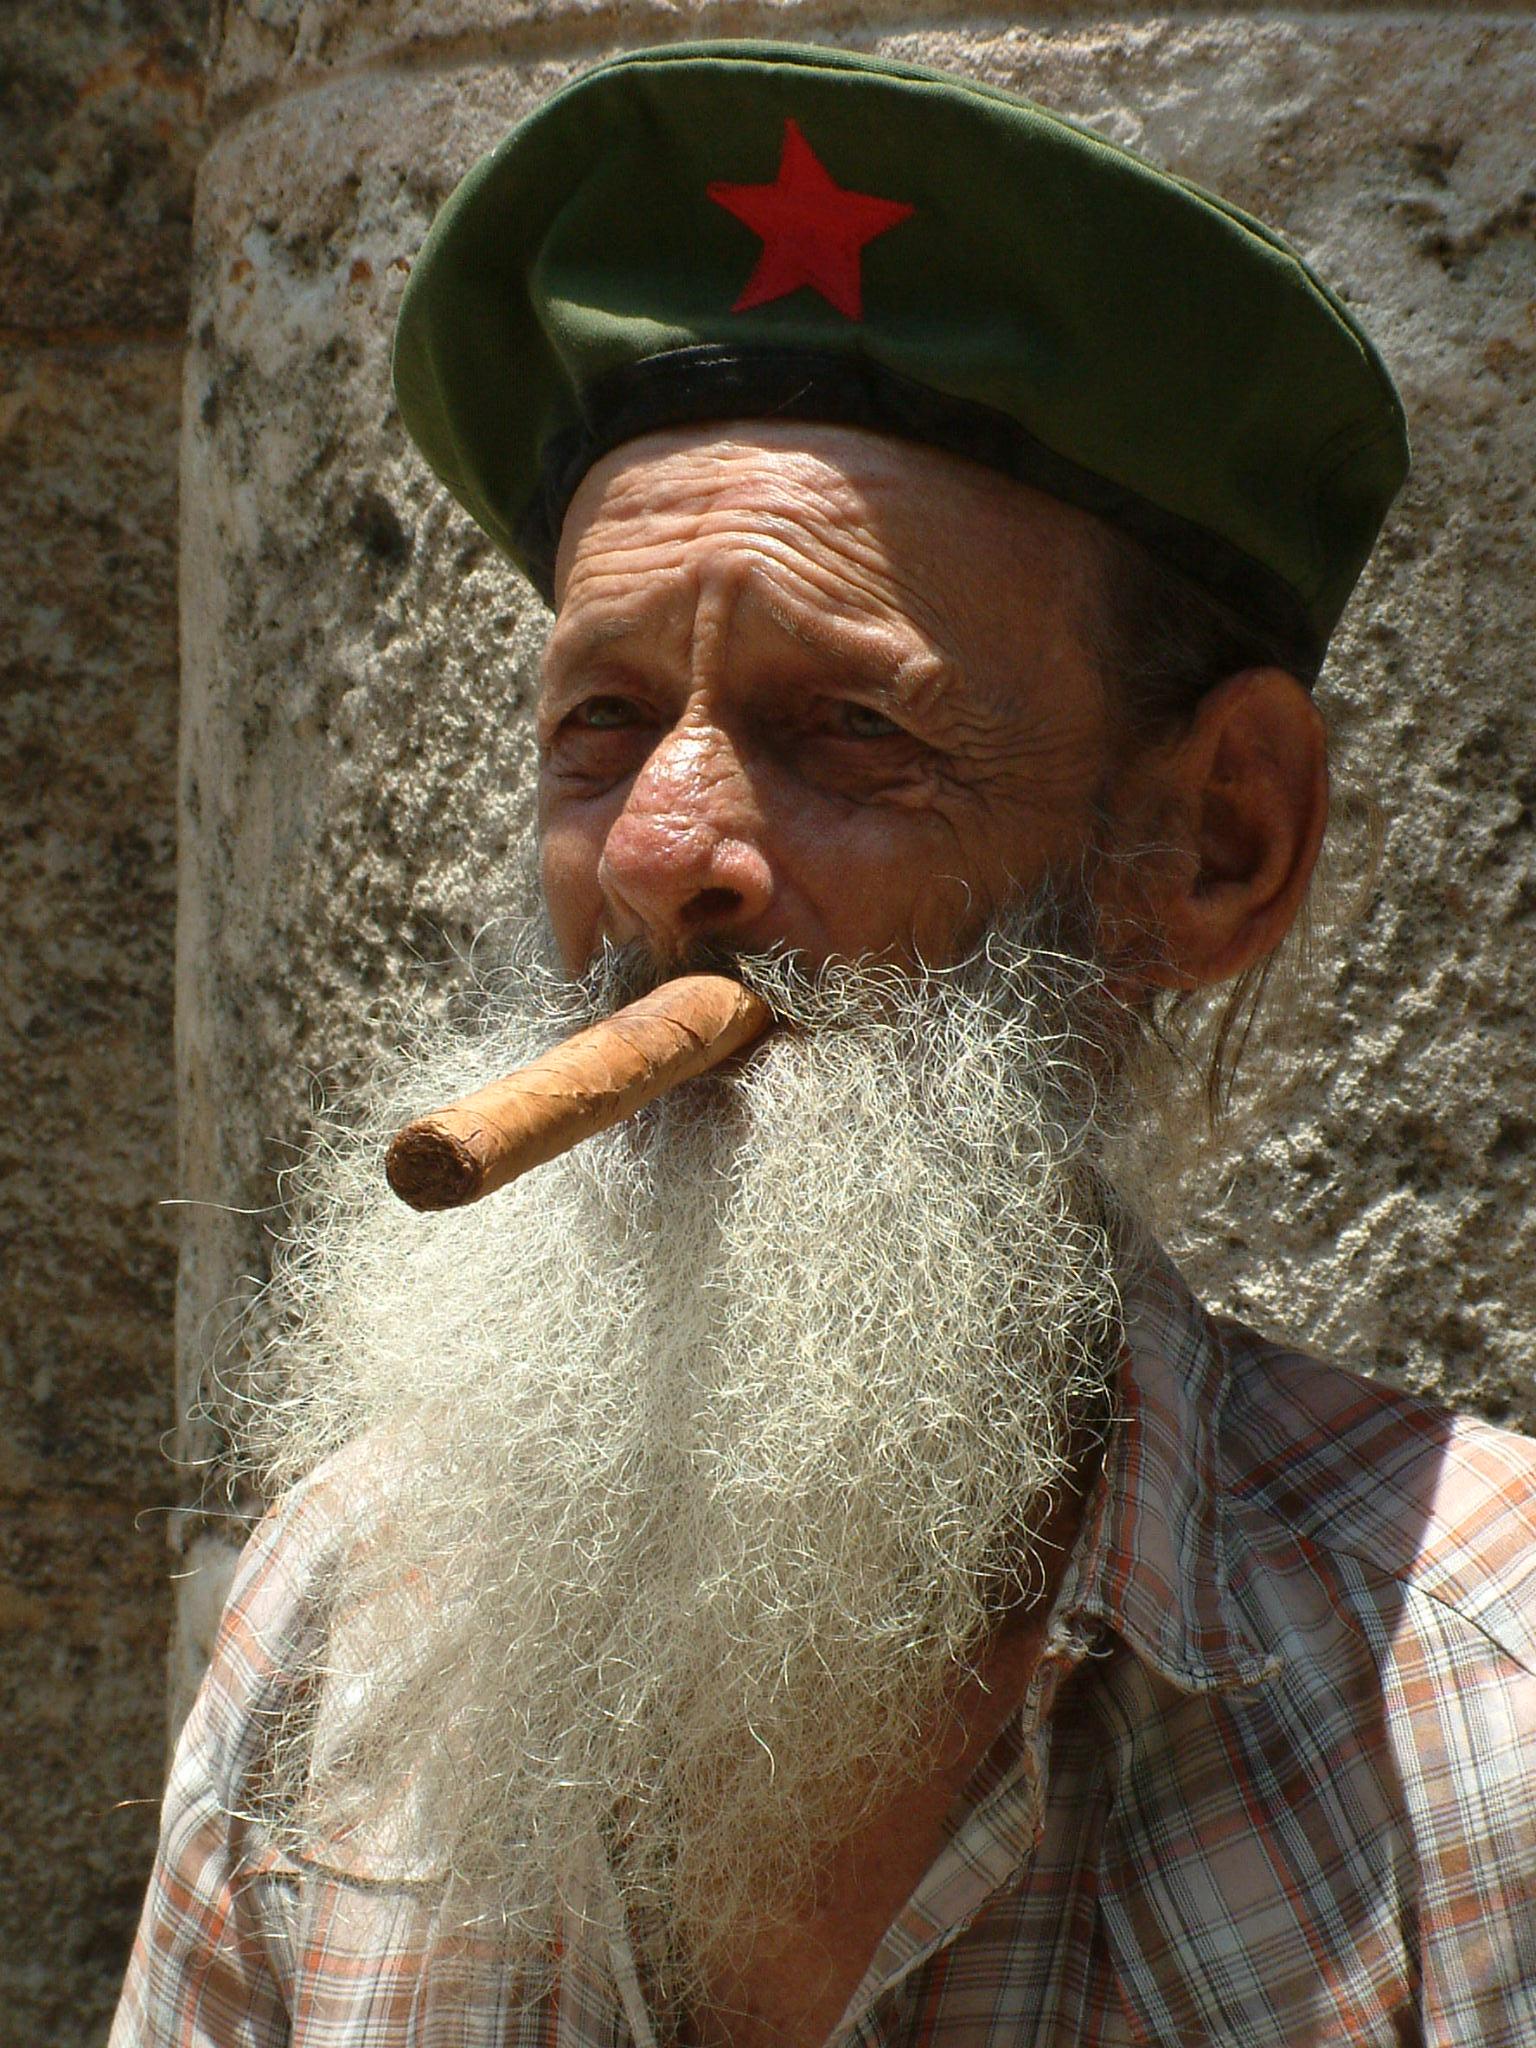 архитектура картинка старик с сигарой хорошо